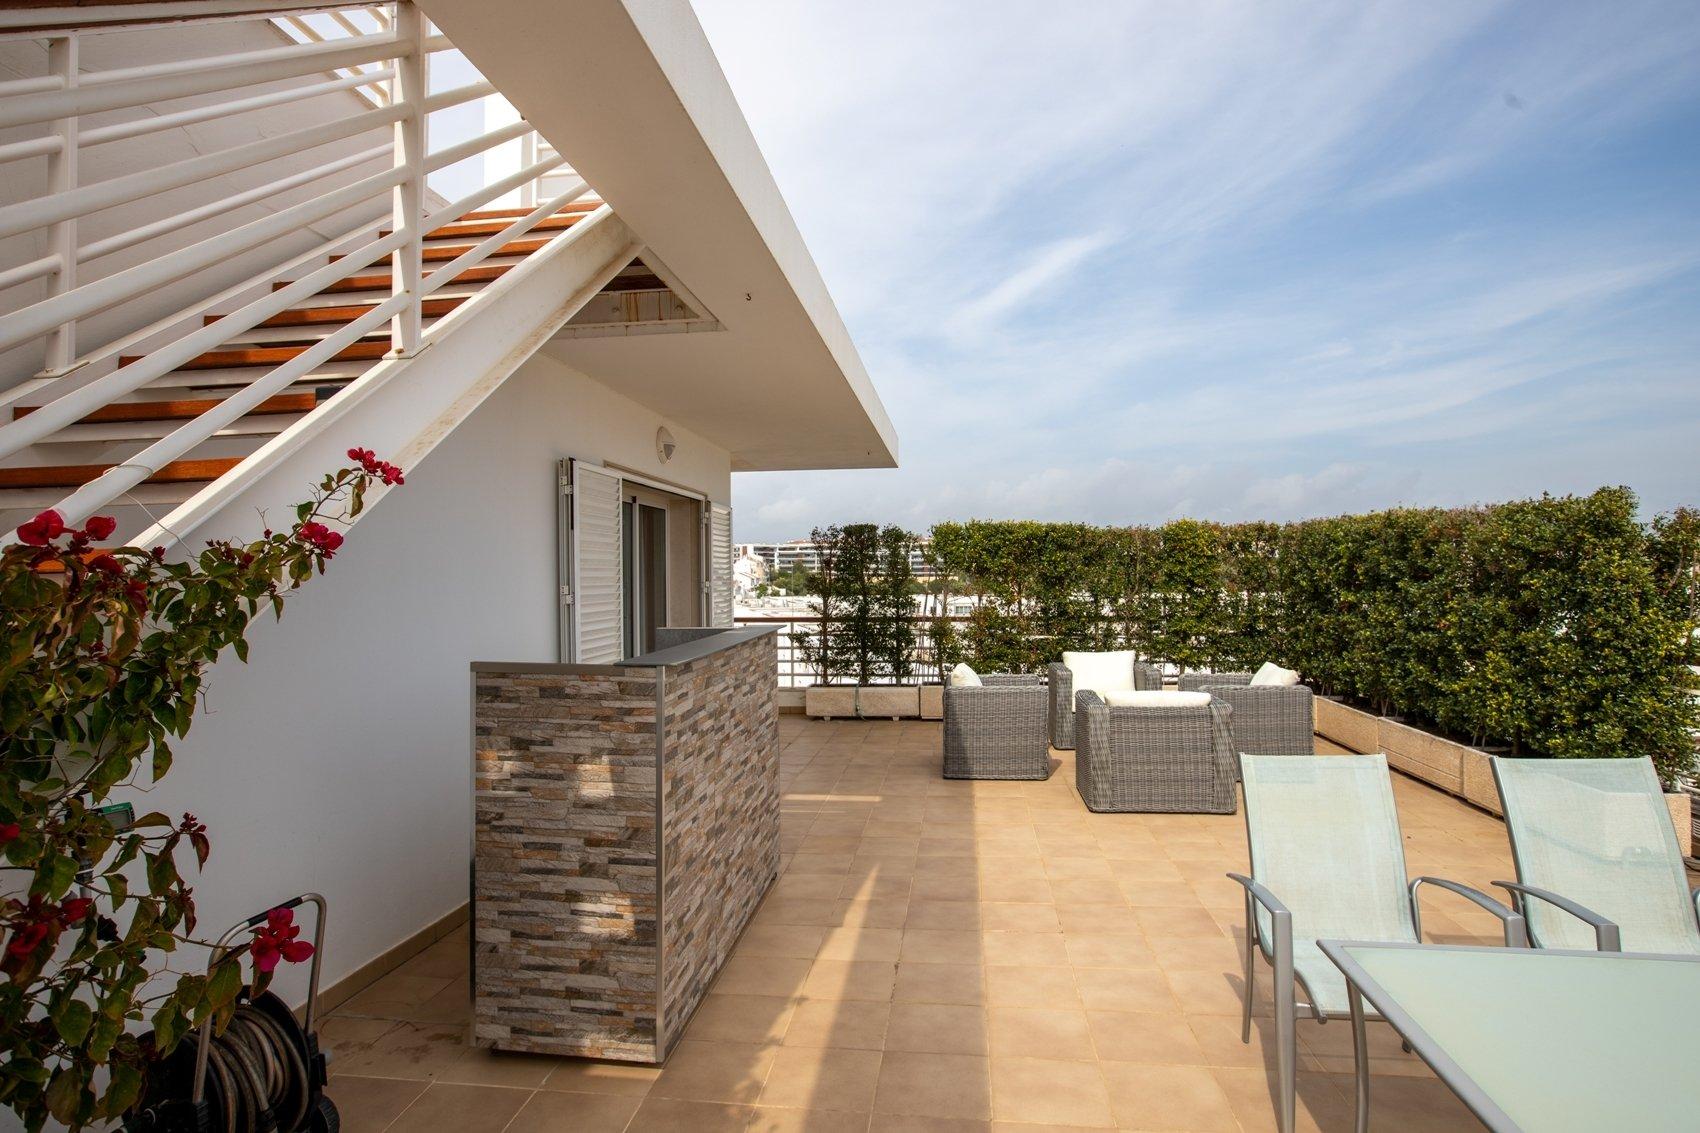 4 Bedroom Penthouse Lagos, Western Algarve Ref: GA404